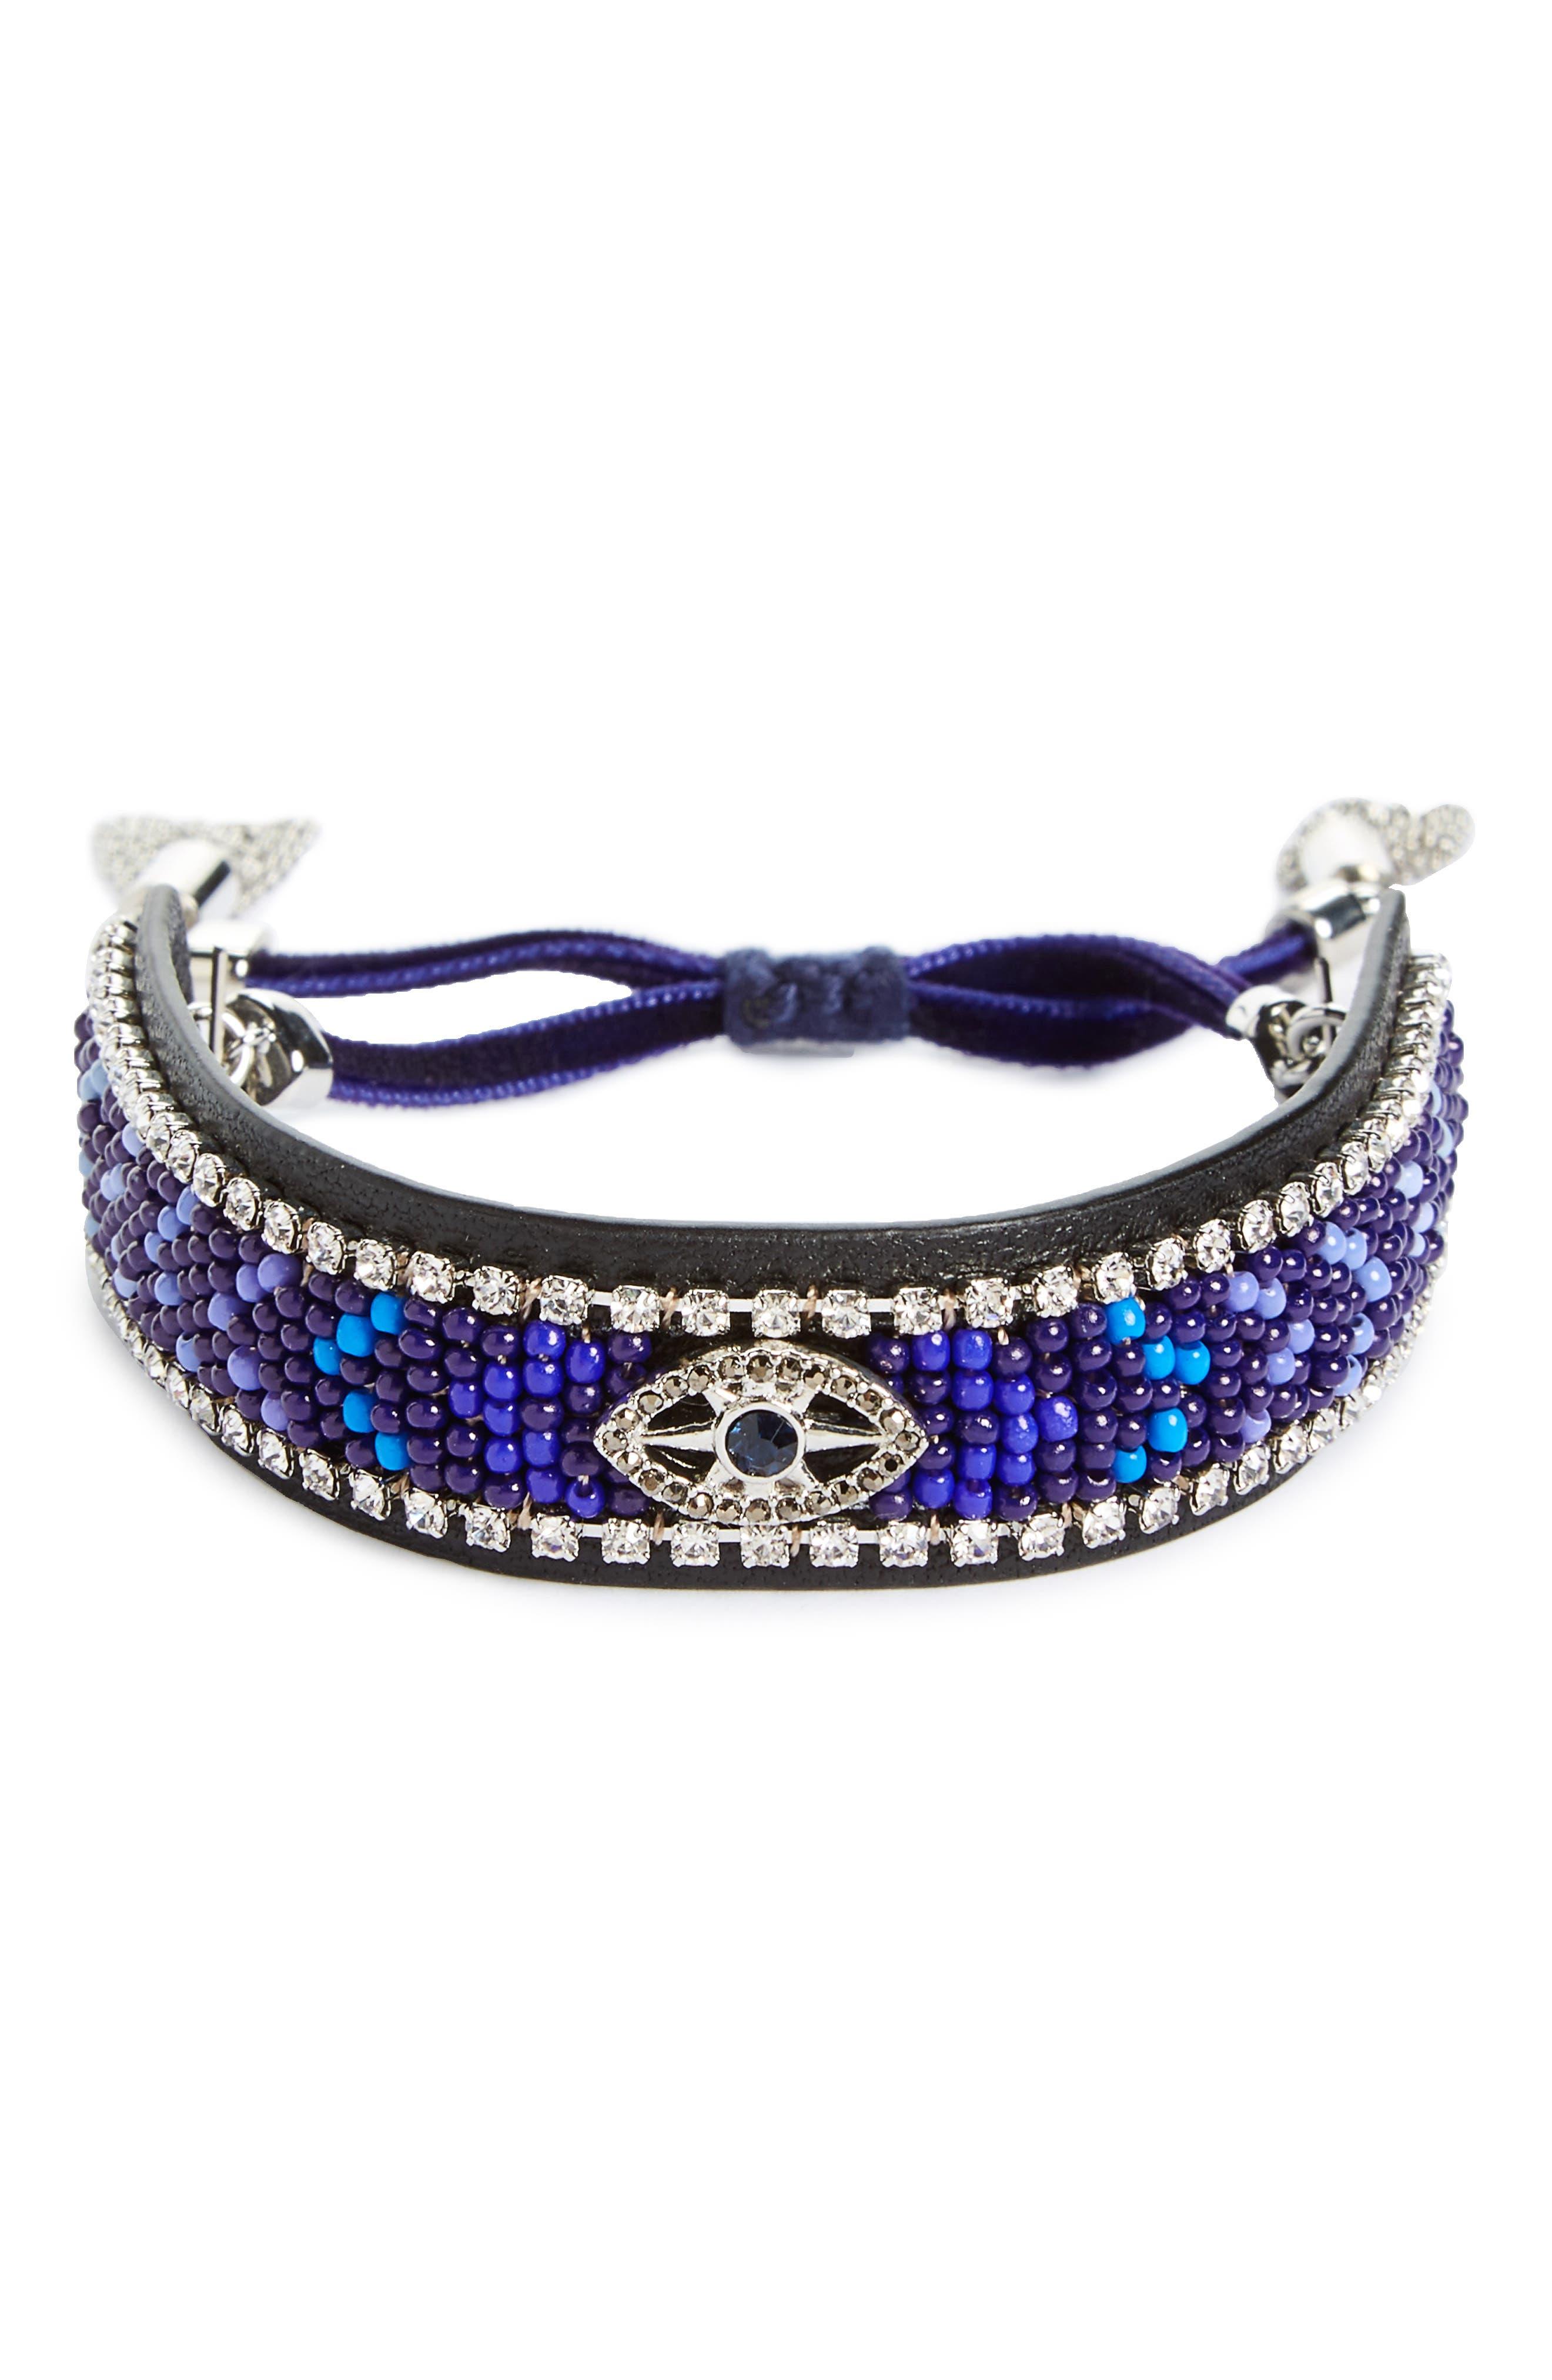 Rebecca Minkoff Celestial Evil Eye Leather Bracelet